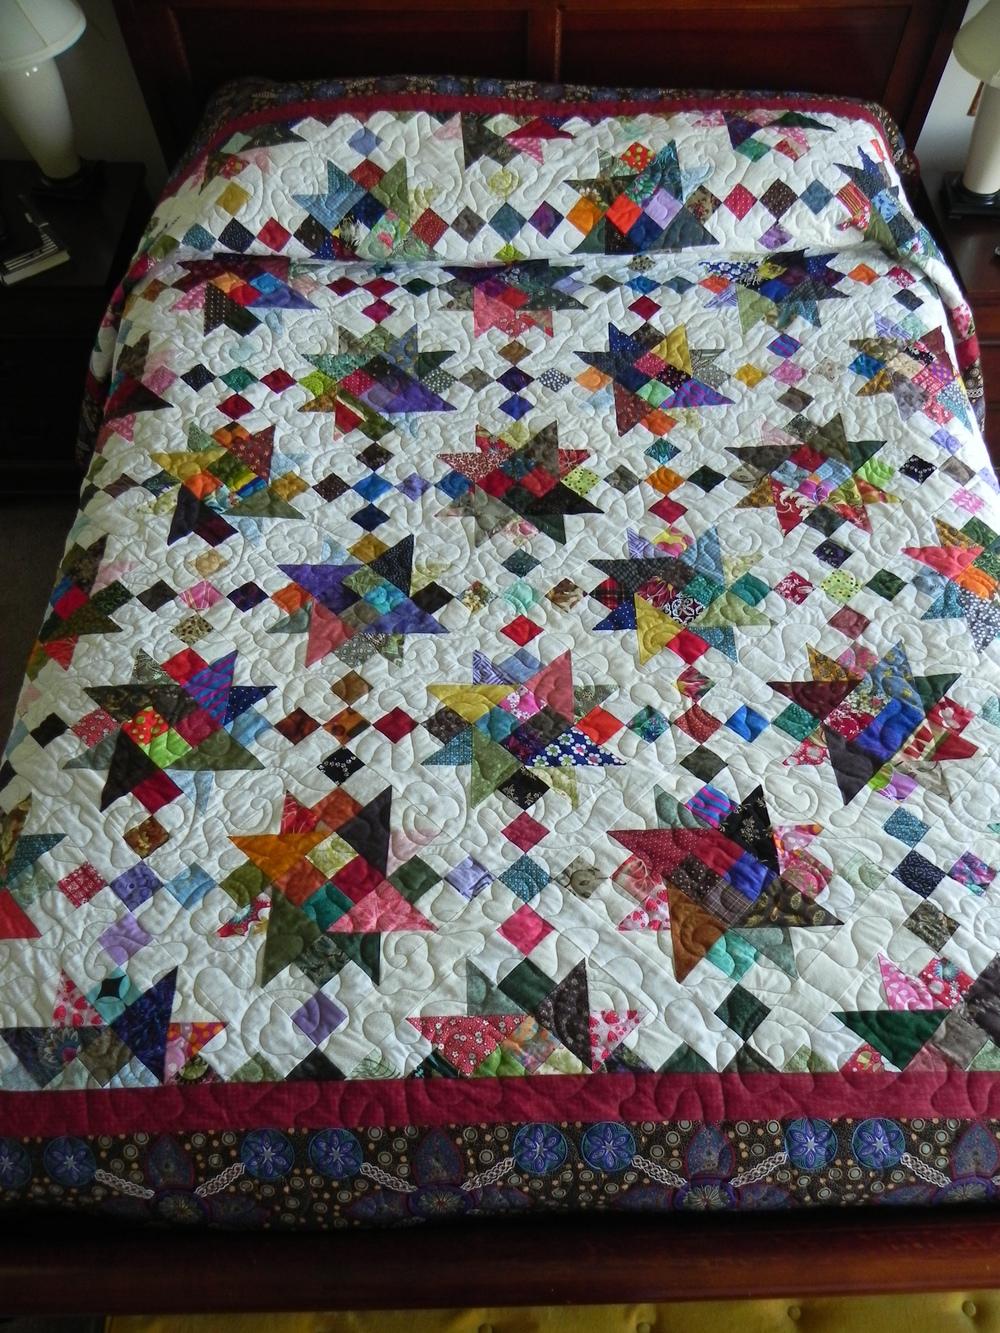 ScrapitBonzaTude--my version of Charlotte's 2013 Scrapitude mystery quilt.